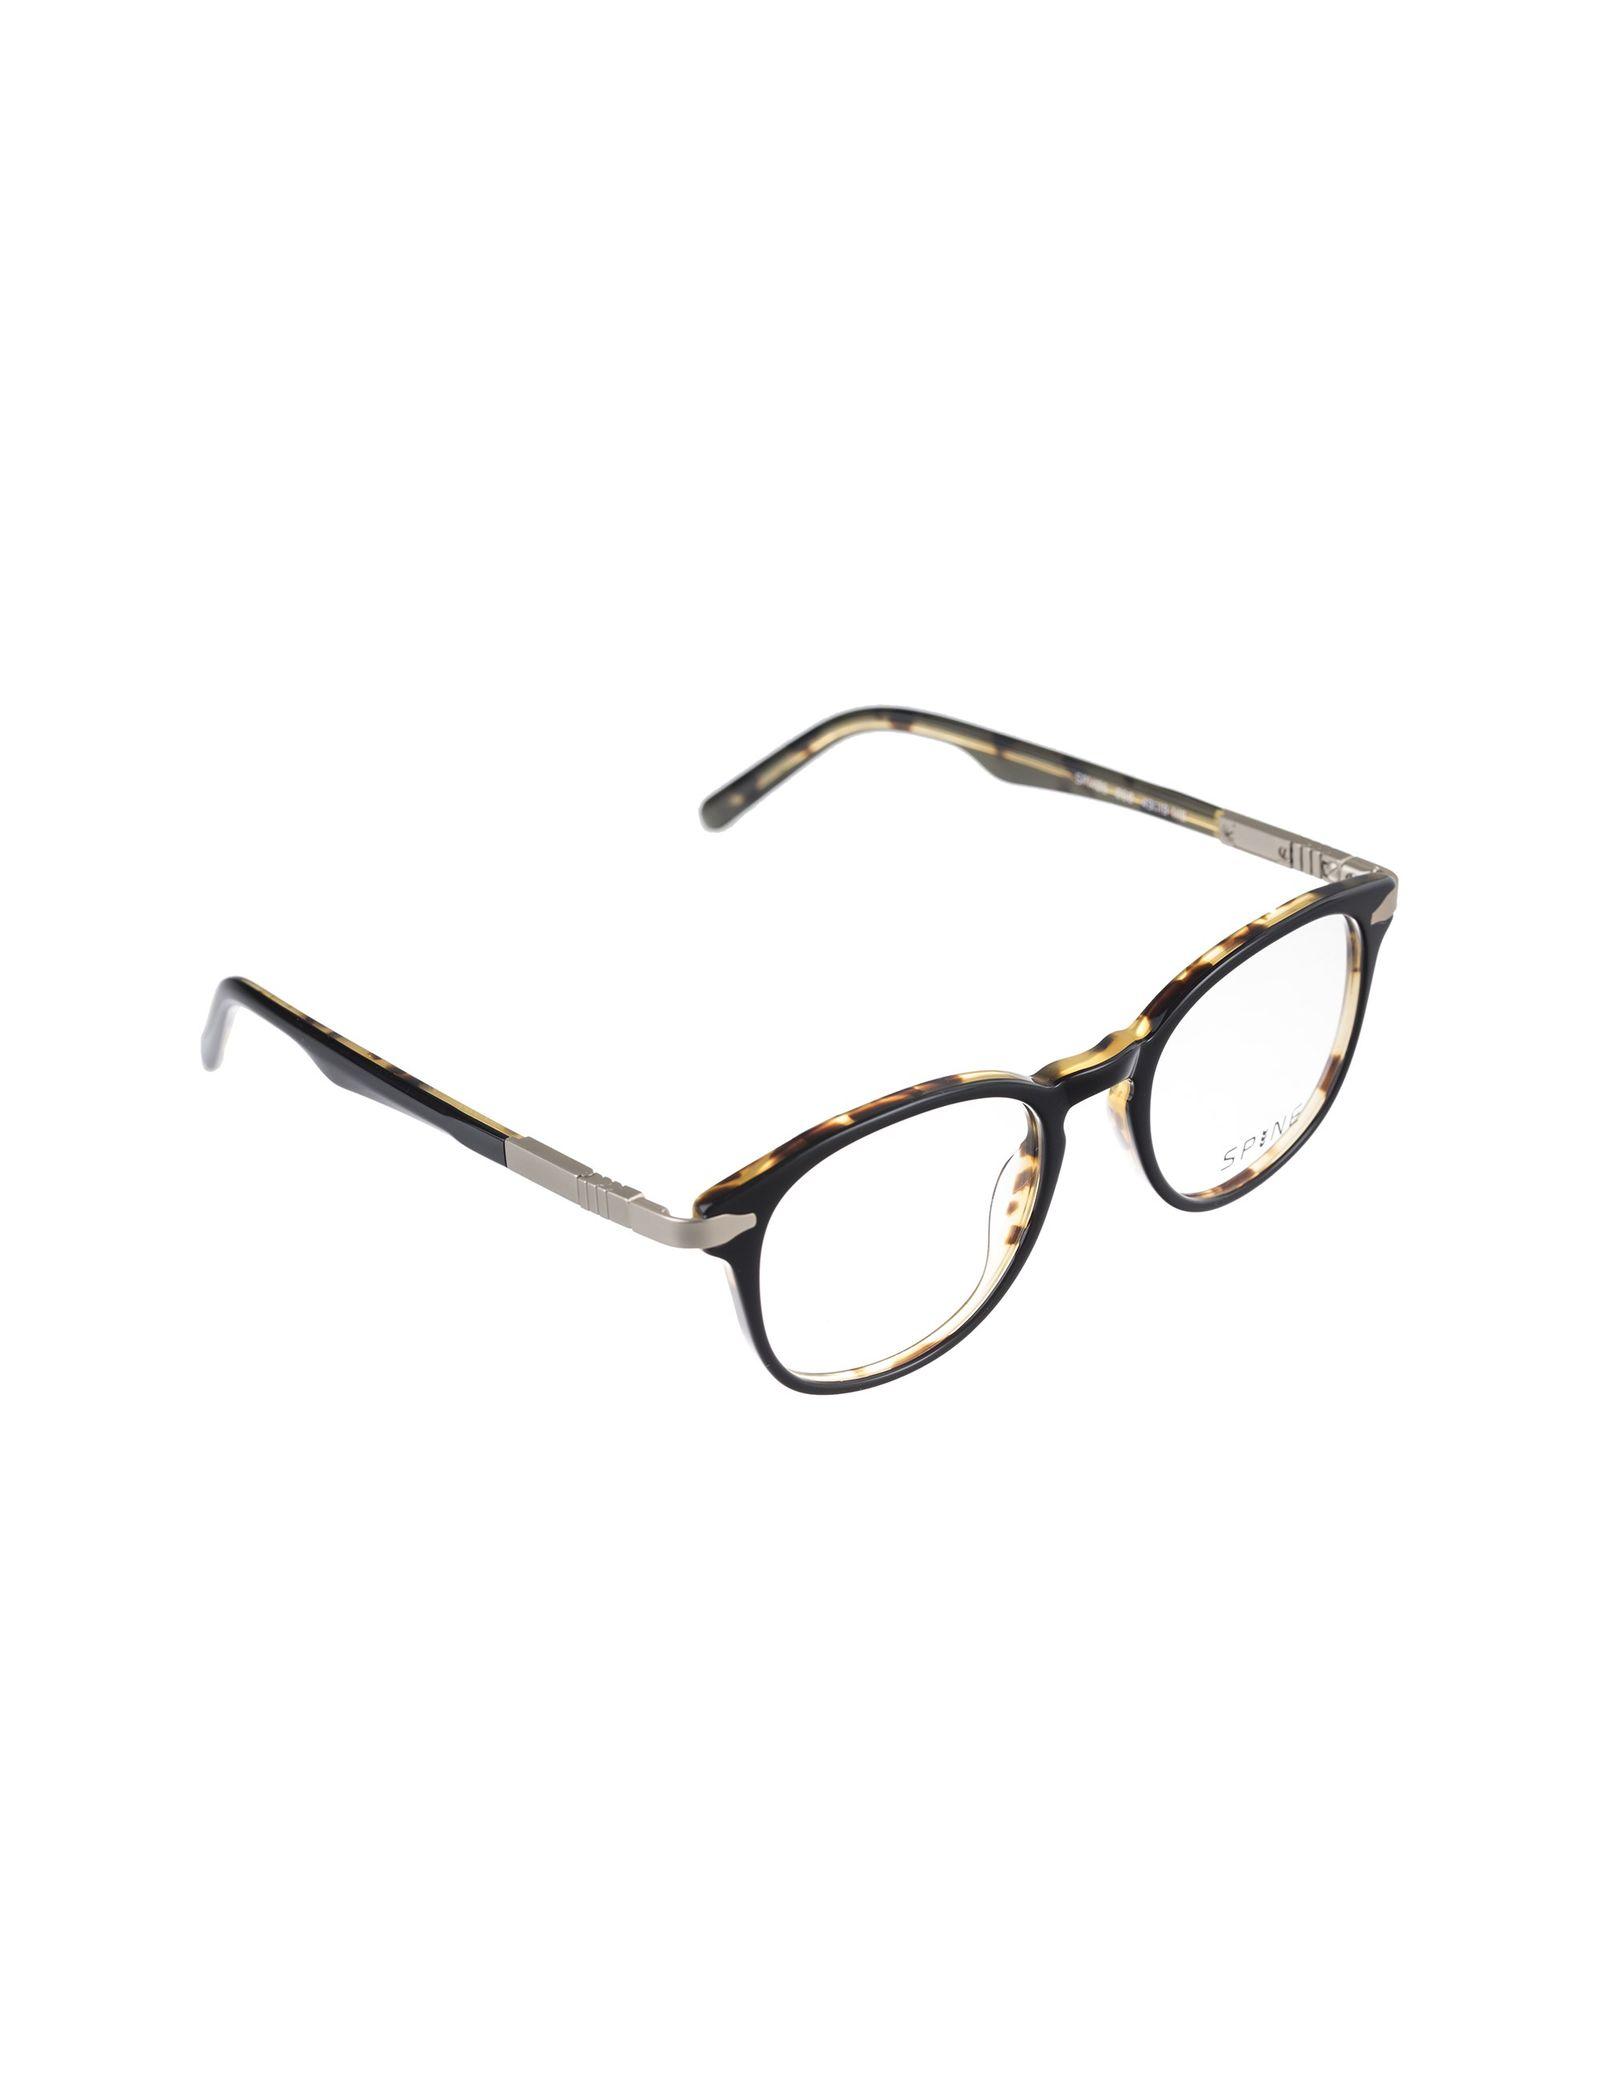 عینک طبی پنتوس مردانه - اسپاین - مشکي  - 4